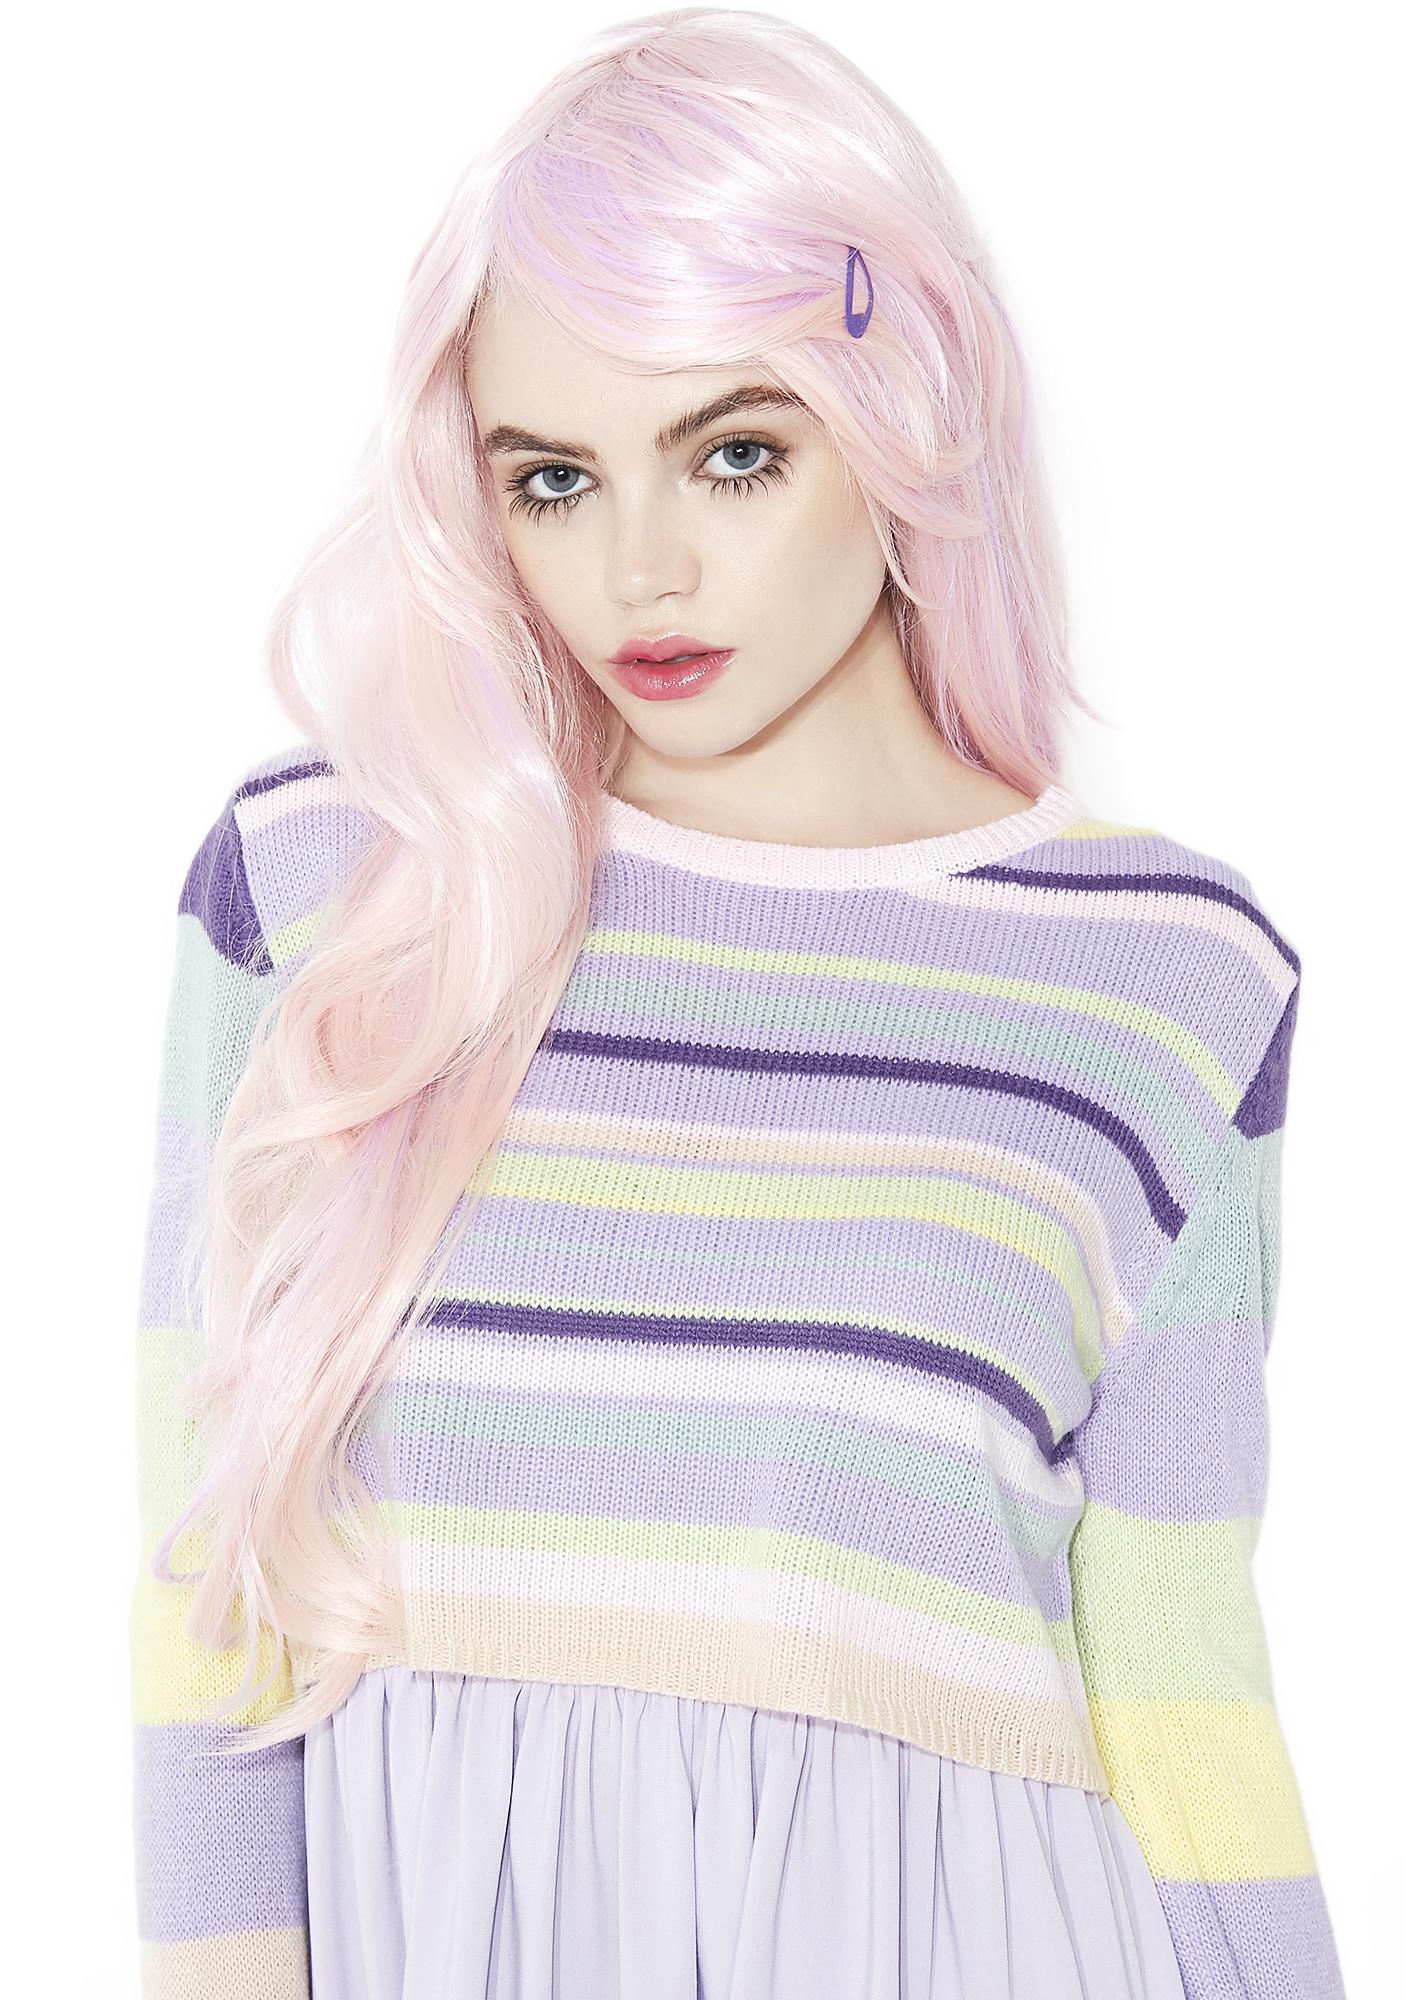 Rockstar Wigs Powder Pink Wavy Wig